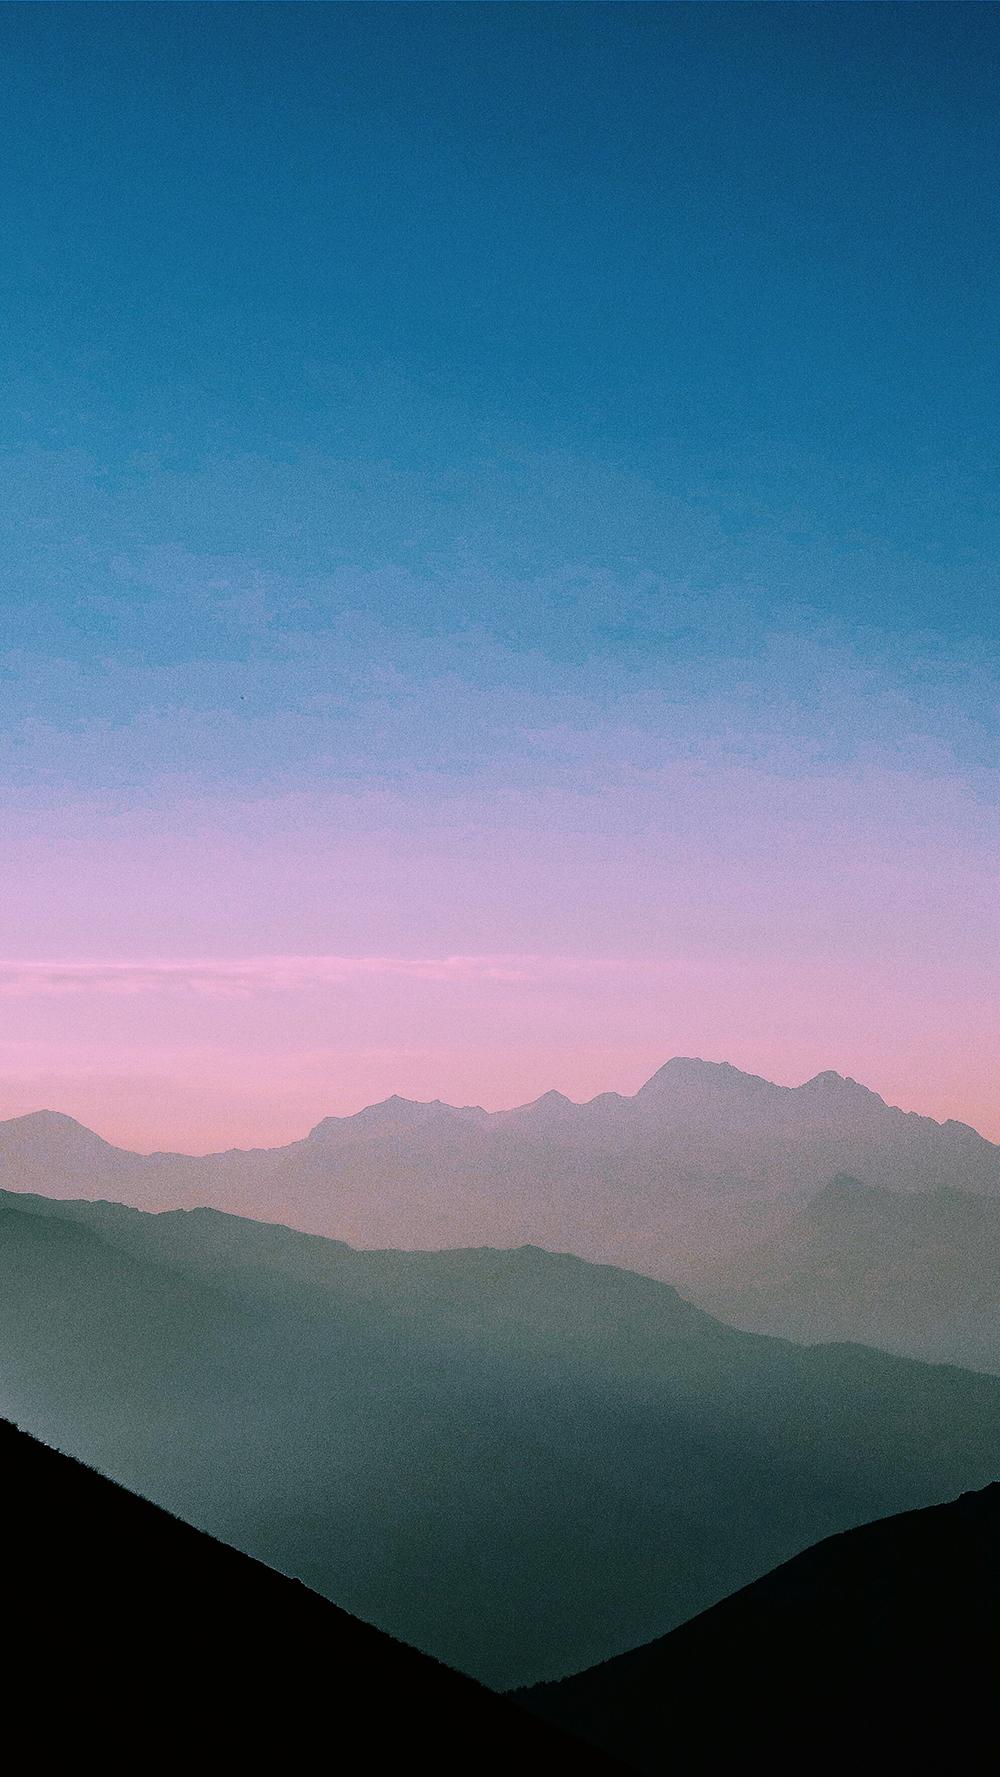 CBD for Stress - Calming mountains